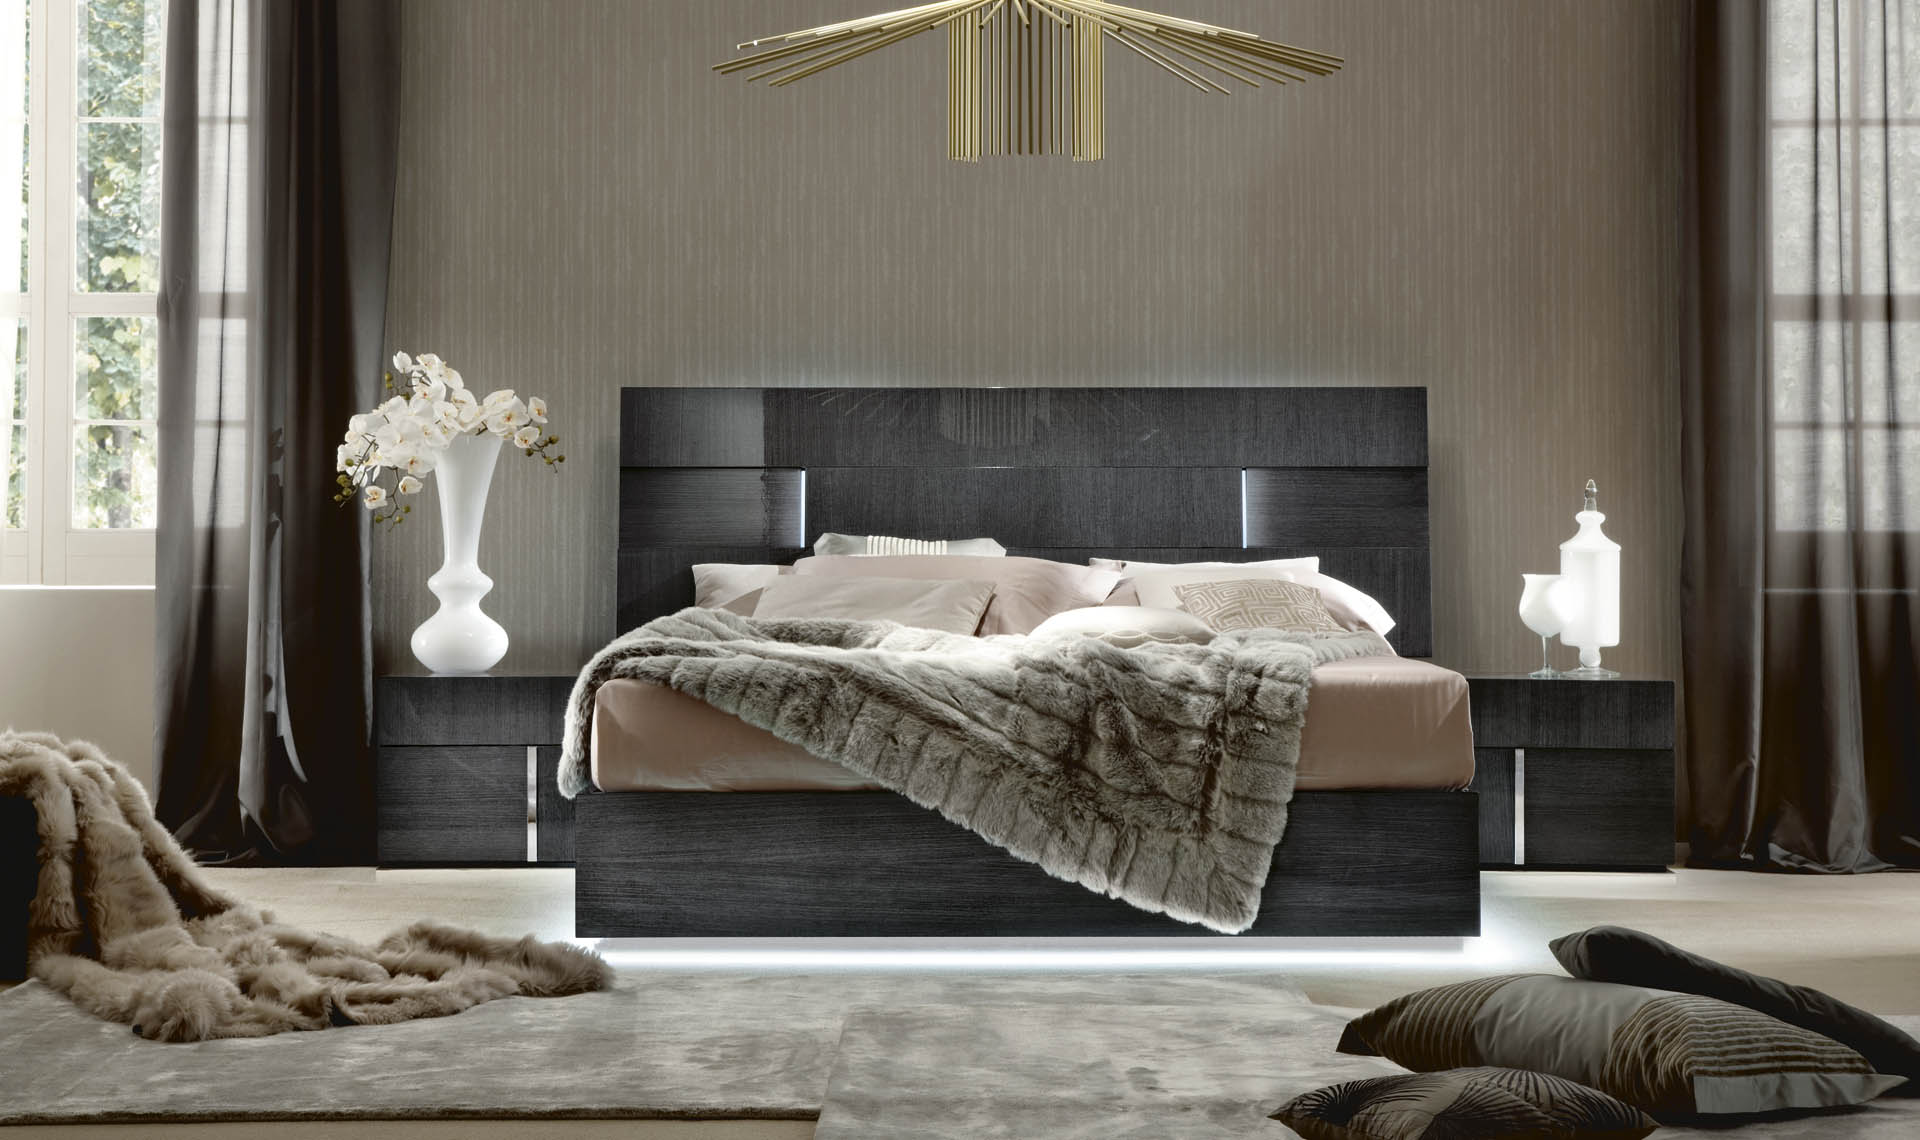 ALF Monte Carlo Bedroom Collection High Gloss Koto Finish